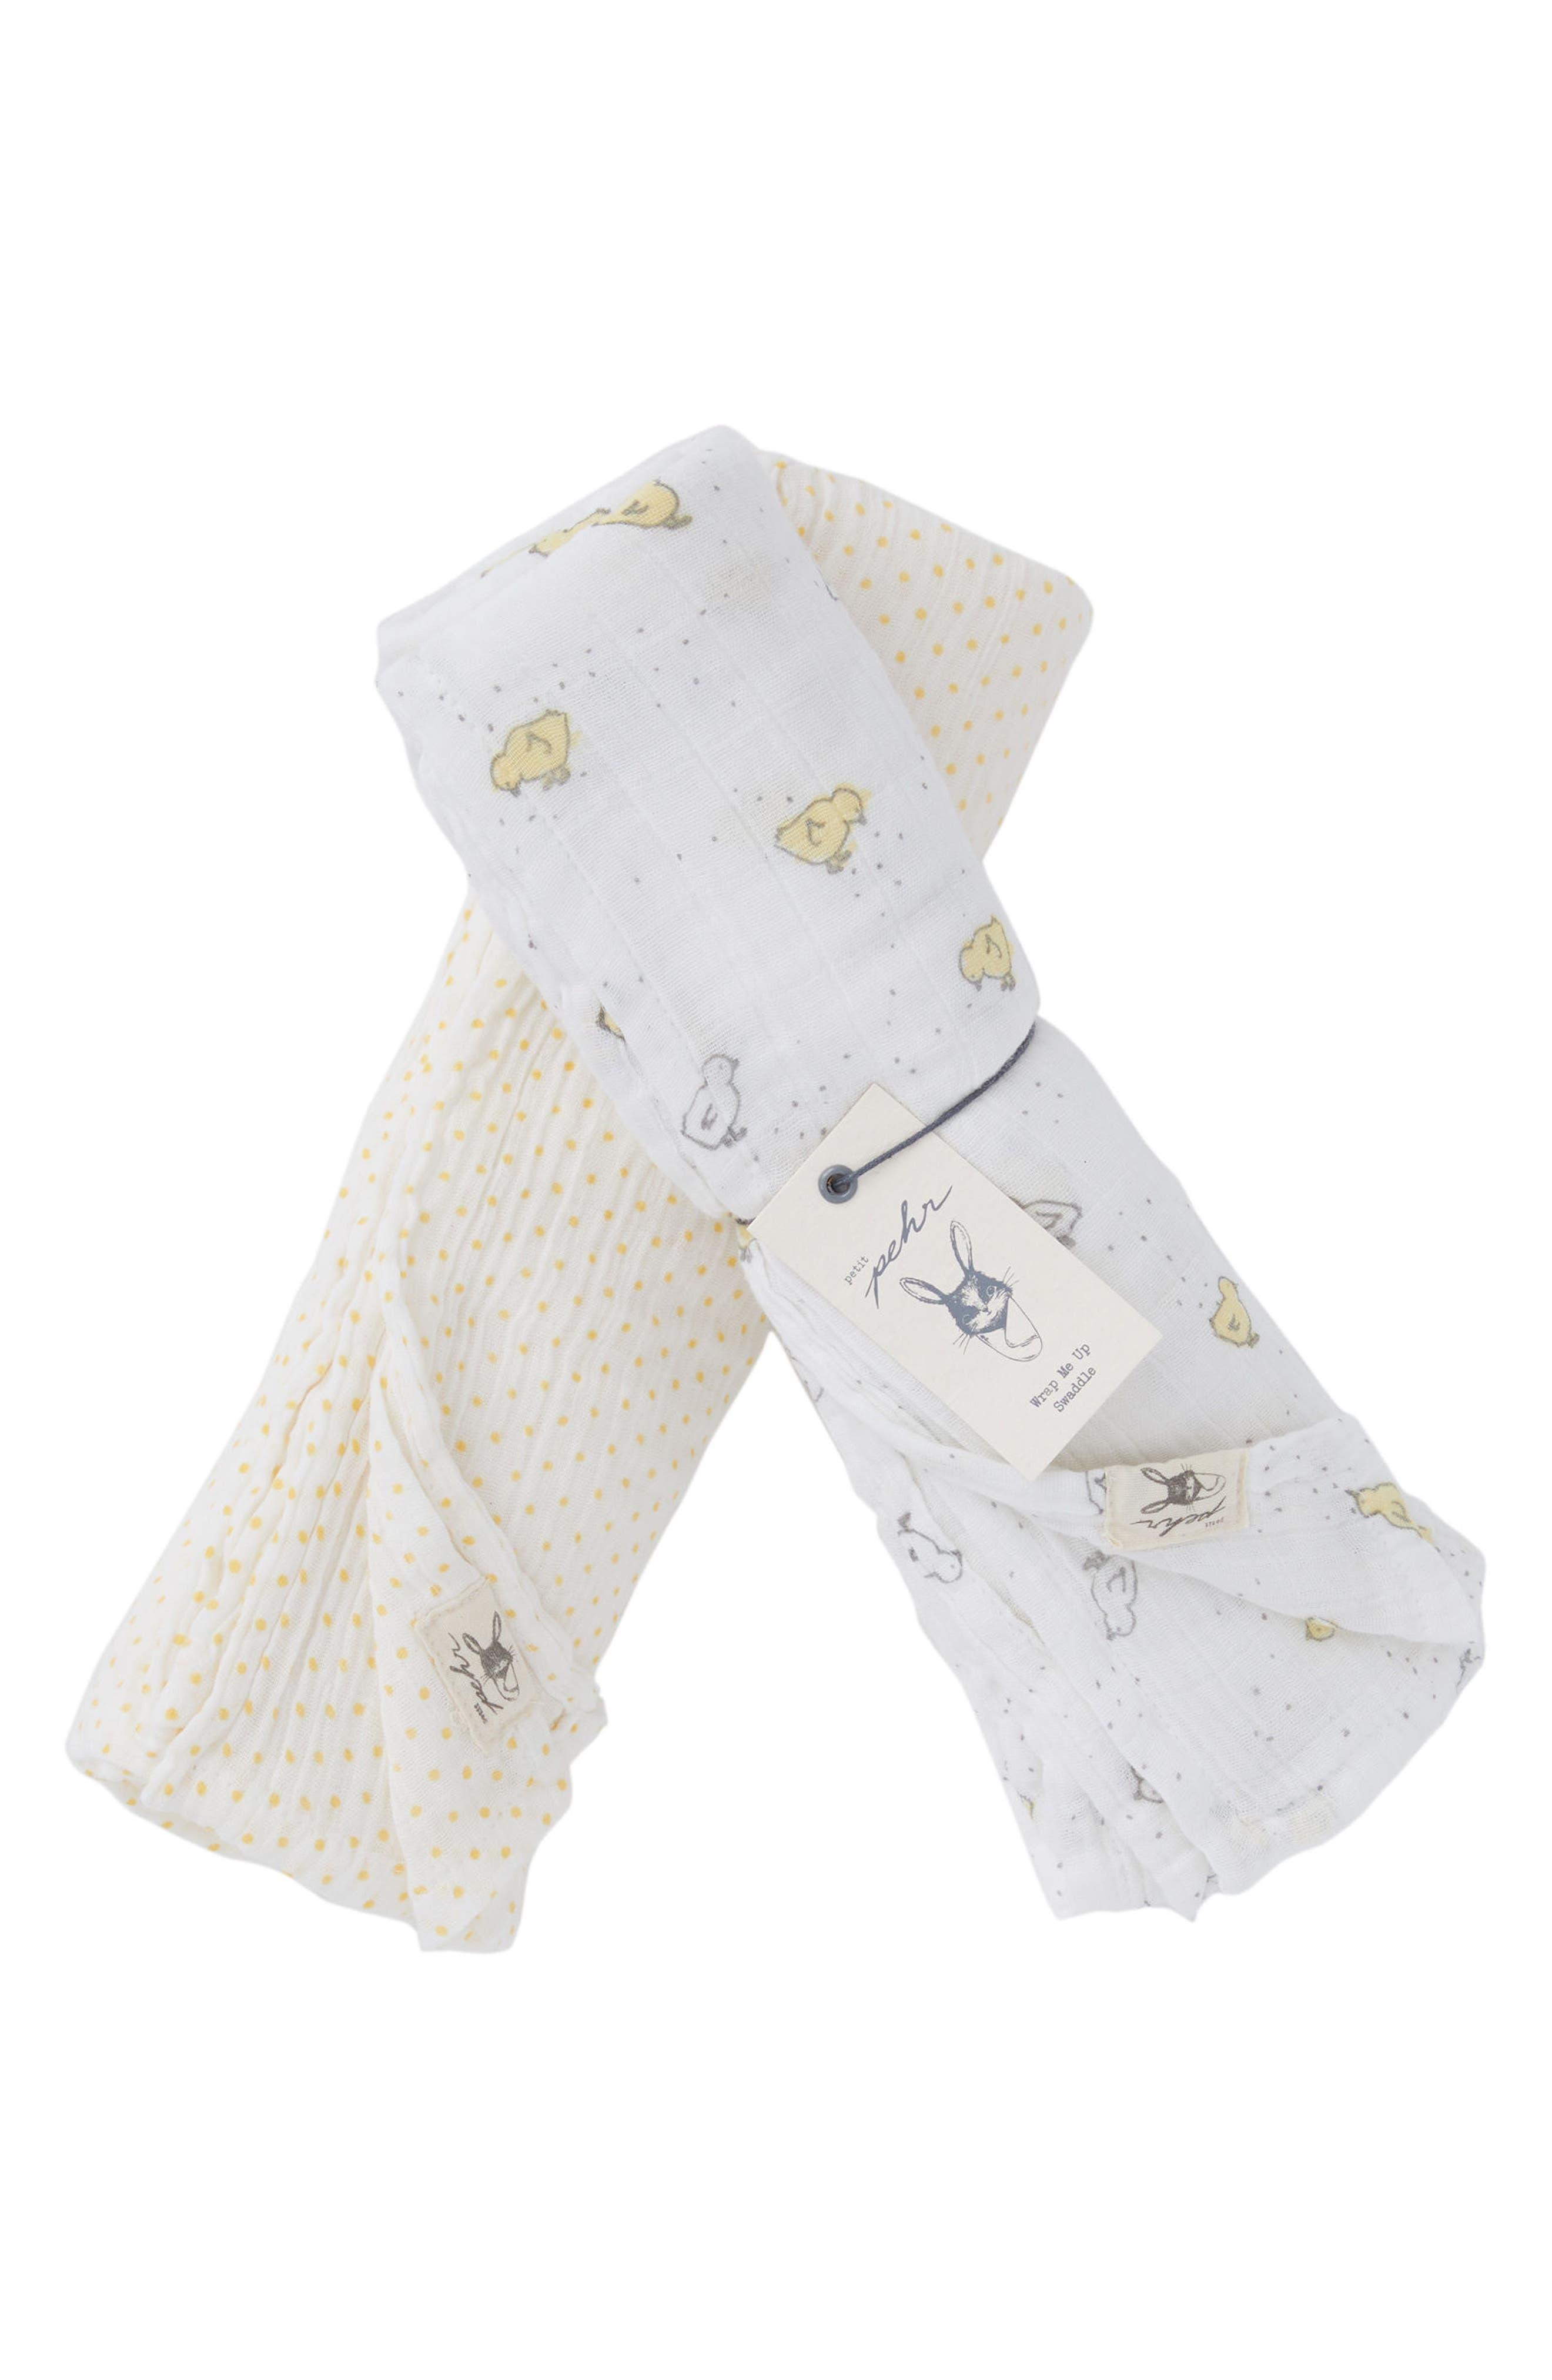 Main Image - Petit Pehr Chick Swaddle Blanket Set (Baby)